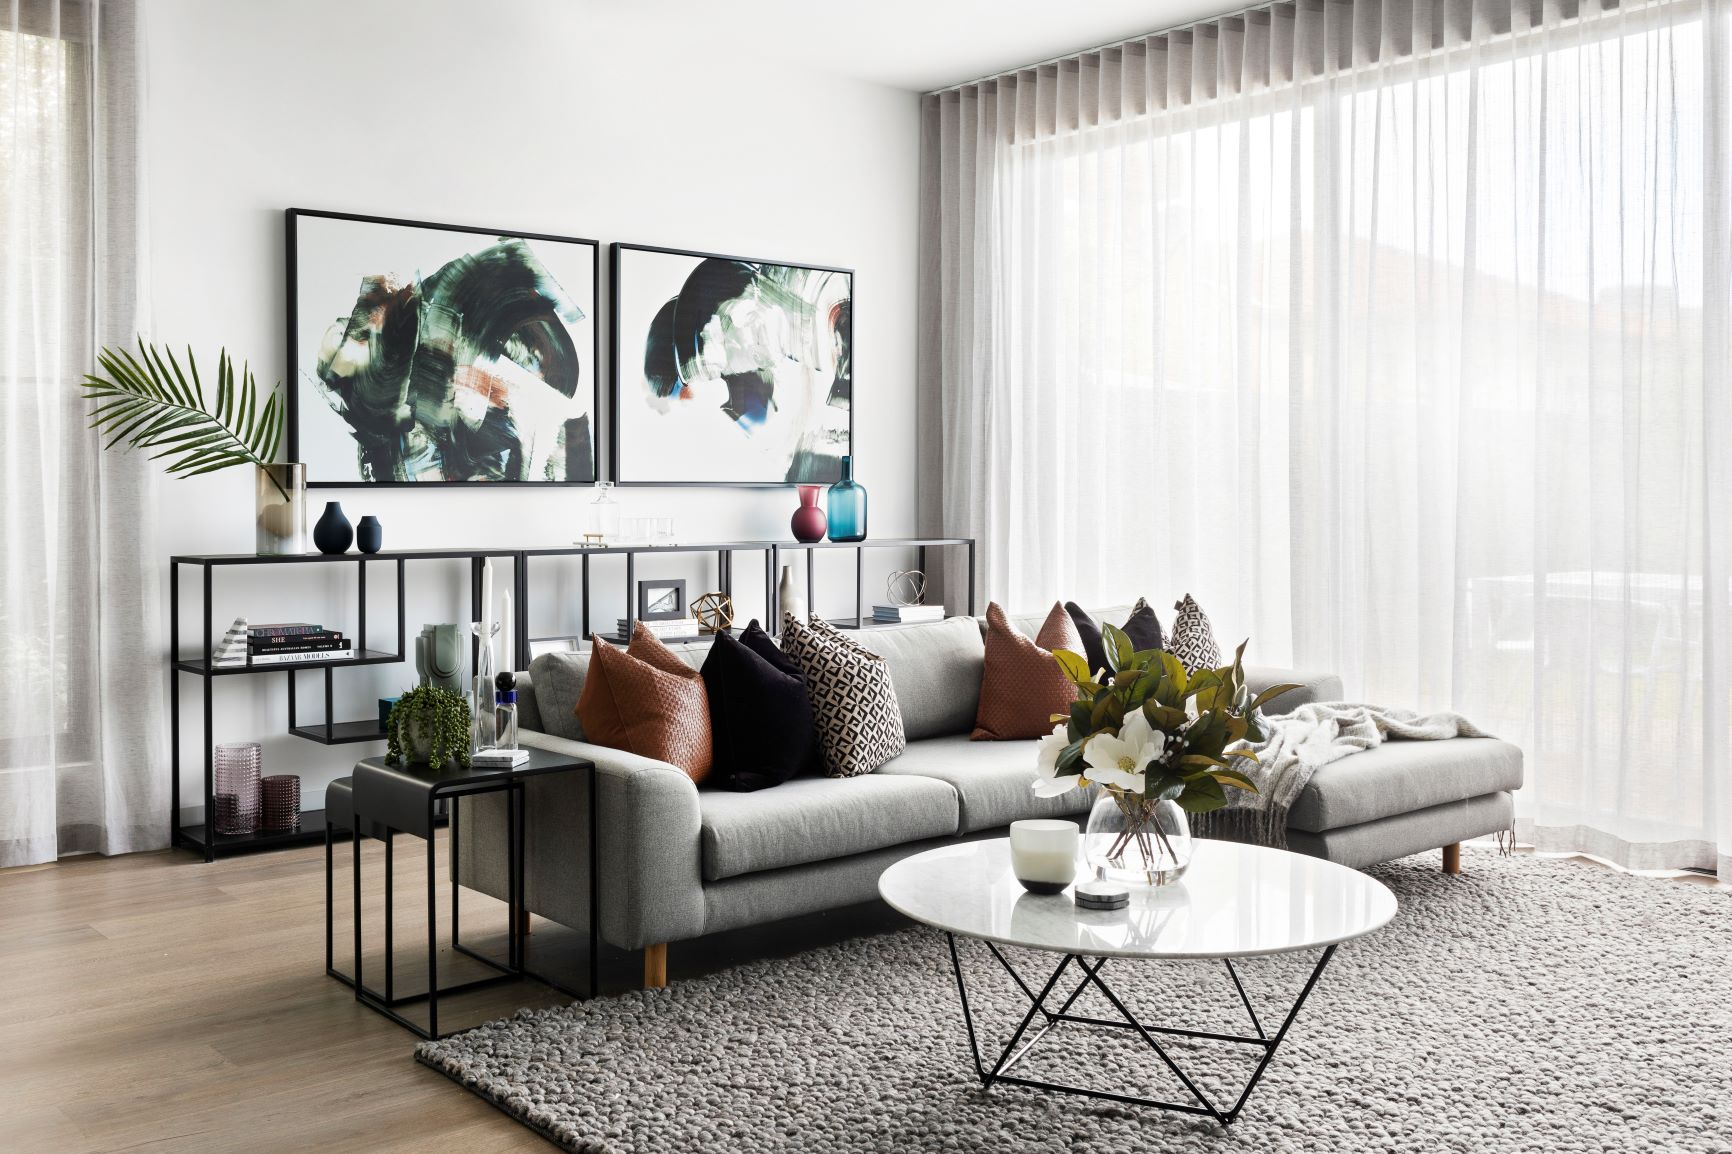 chris-carroll-tlc-interiors-living-room-design